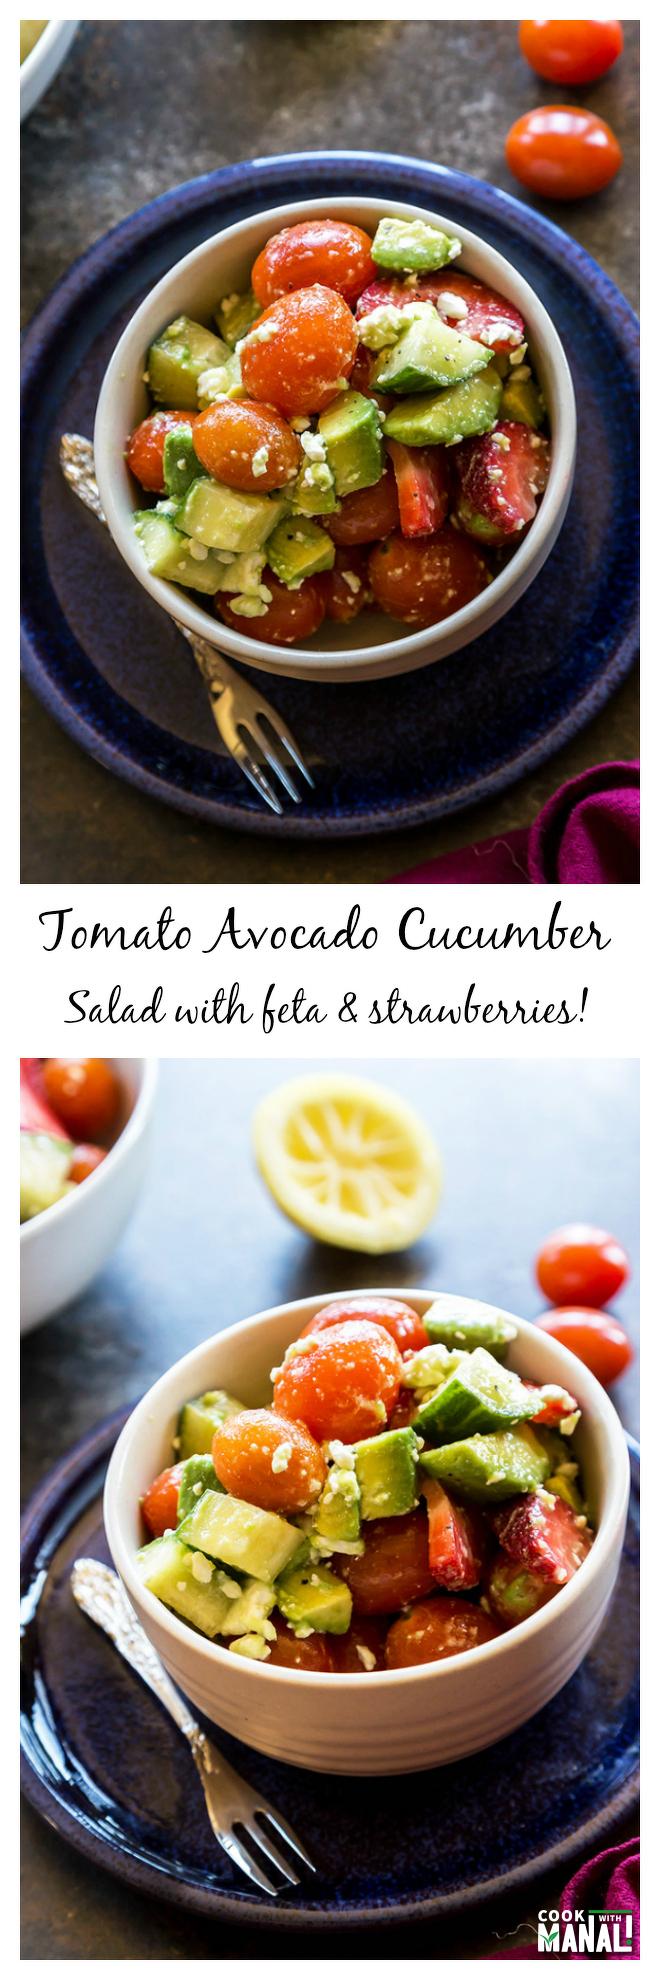 Tomato Avocado Cucumber Salad Collage